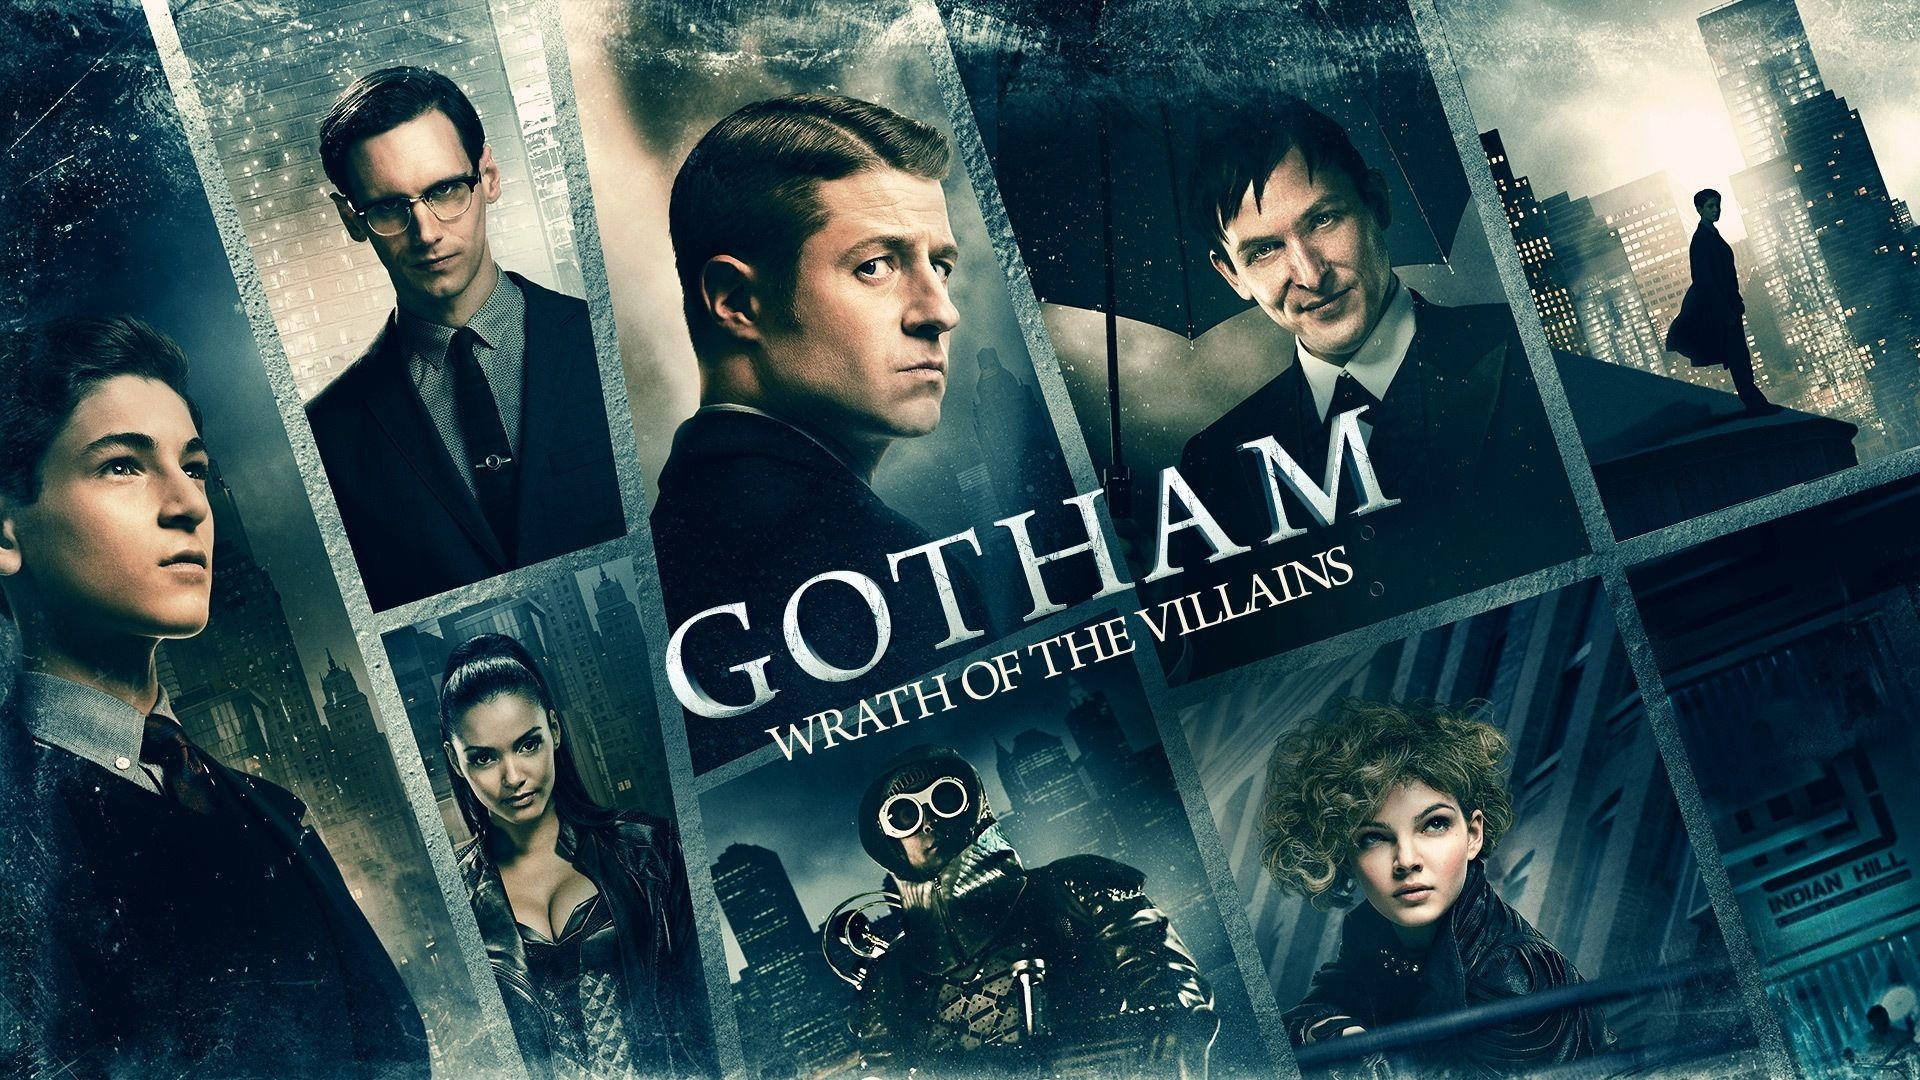 Gotham wallpapers wallpaper cave - Gotham wallpaper ...